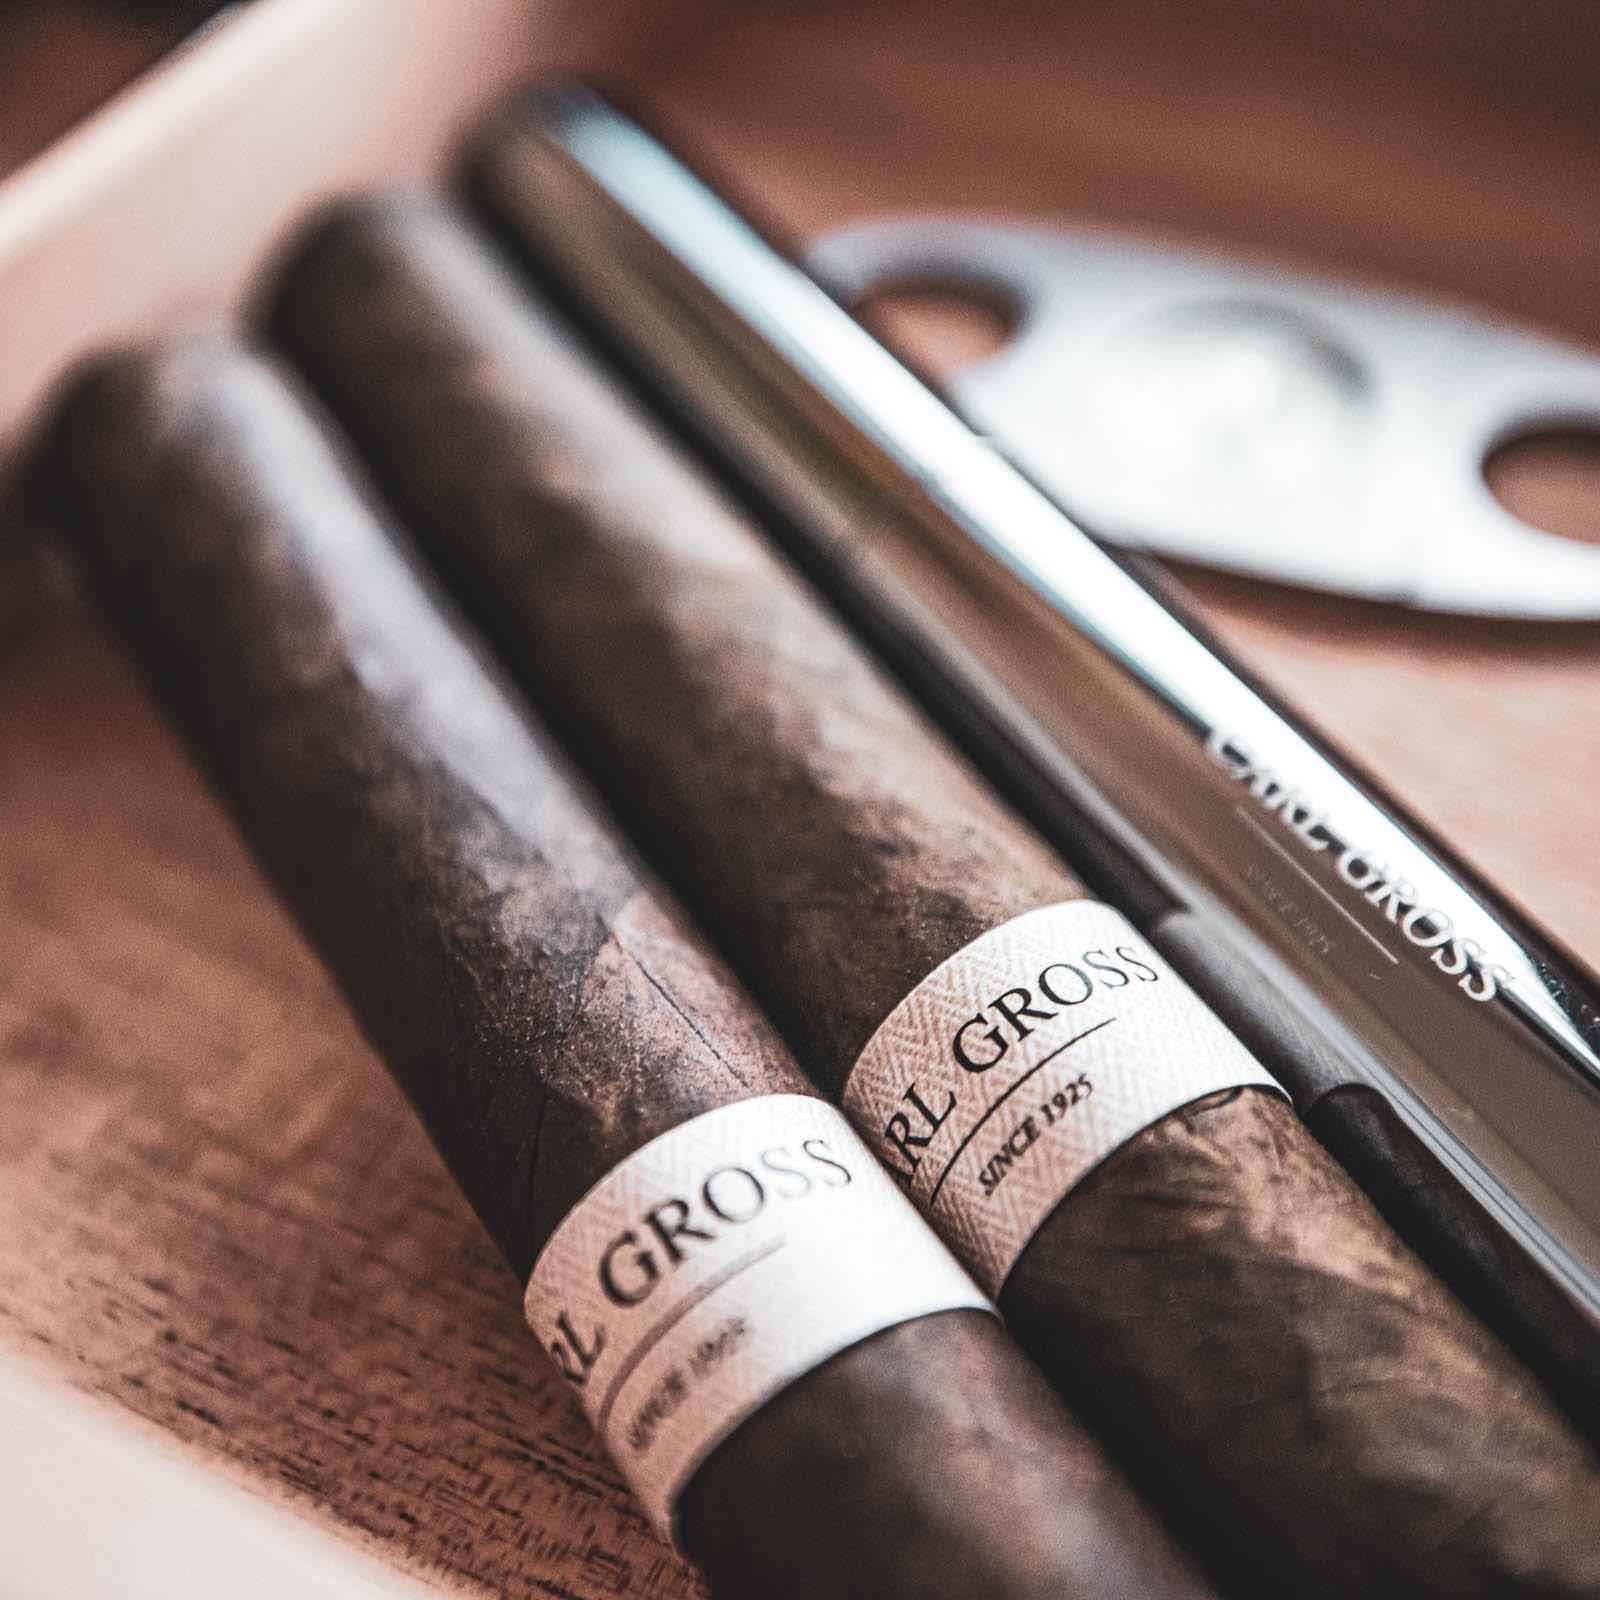 Zigarrendreher | Hamburg | Zigarren | Drehen | Zigarrenroller | Mieten | Anfragen | Trocadero | Eigenmarke | Own | Brand | Handgemacht | Zigarren | Bauchbinde | kaufen | Robusto | Corona | Torpedo | Hamburg | Feiert